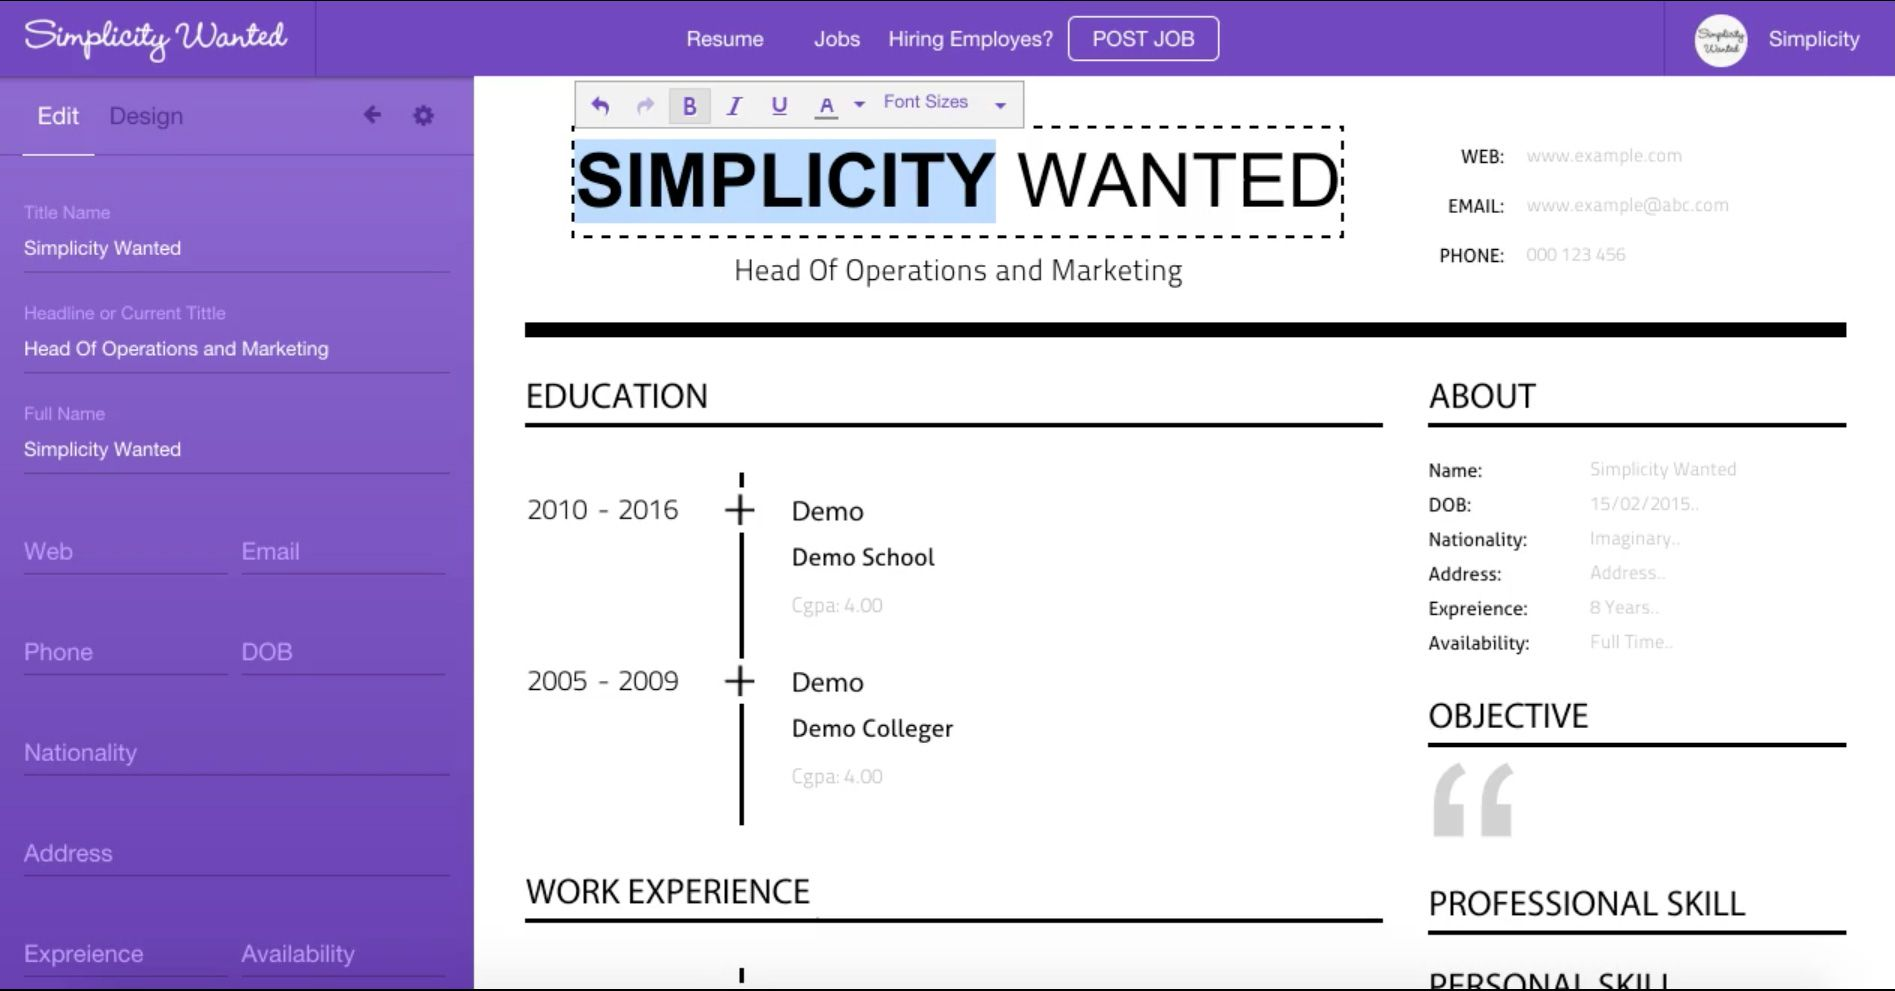 Resume Builder Resume builder, Online resume, Online